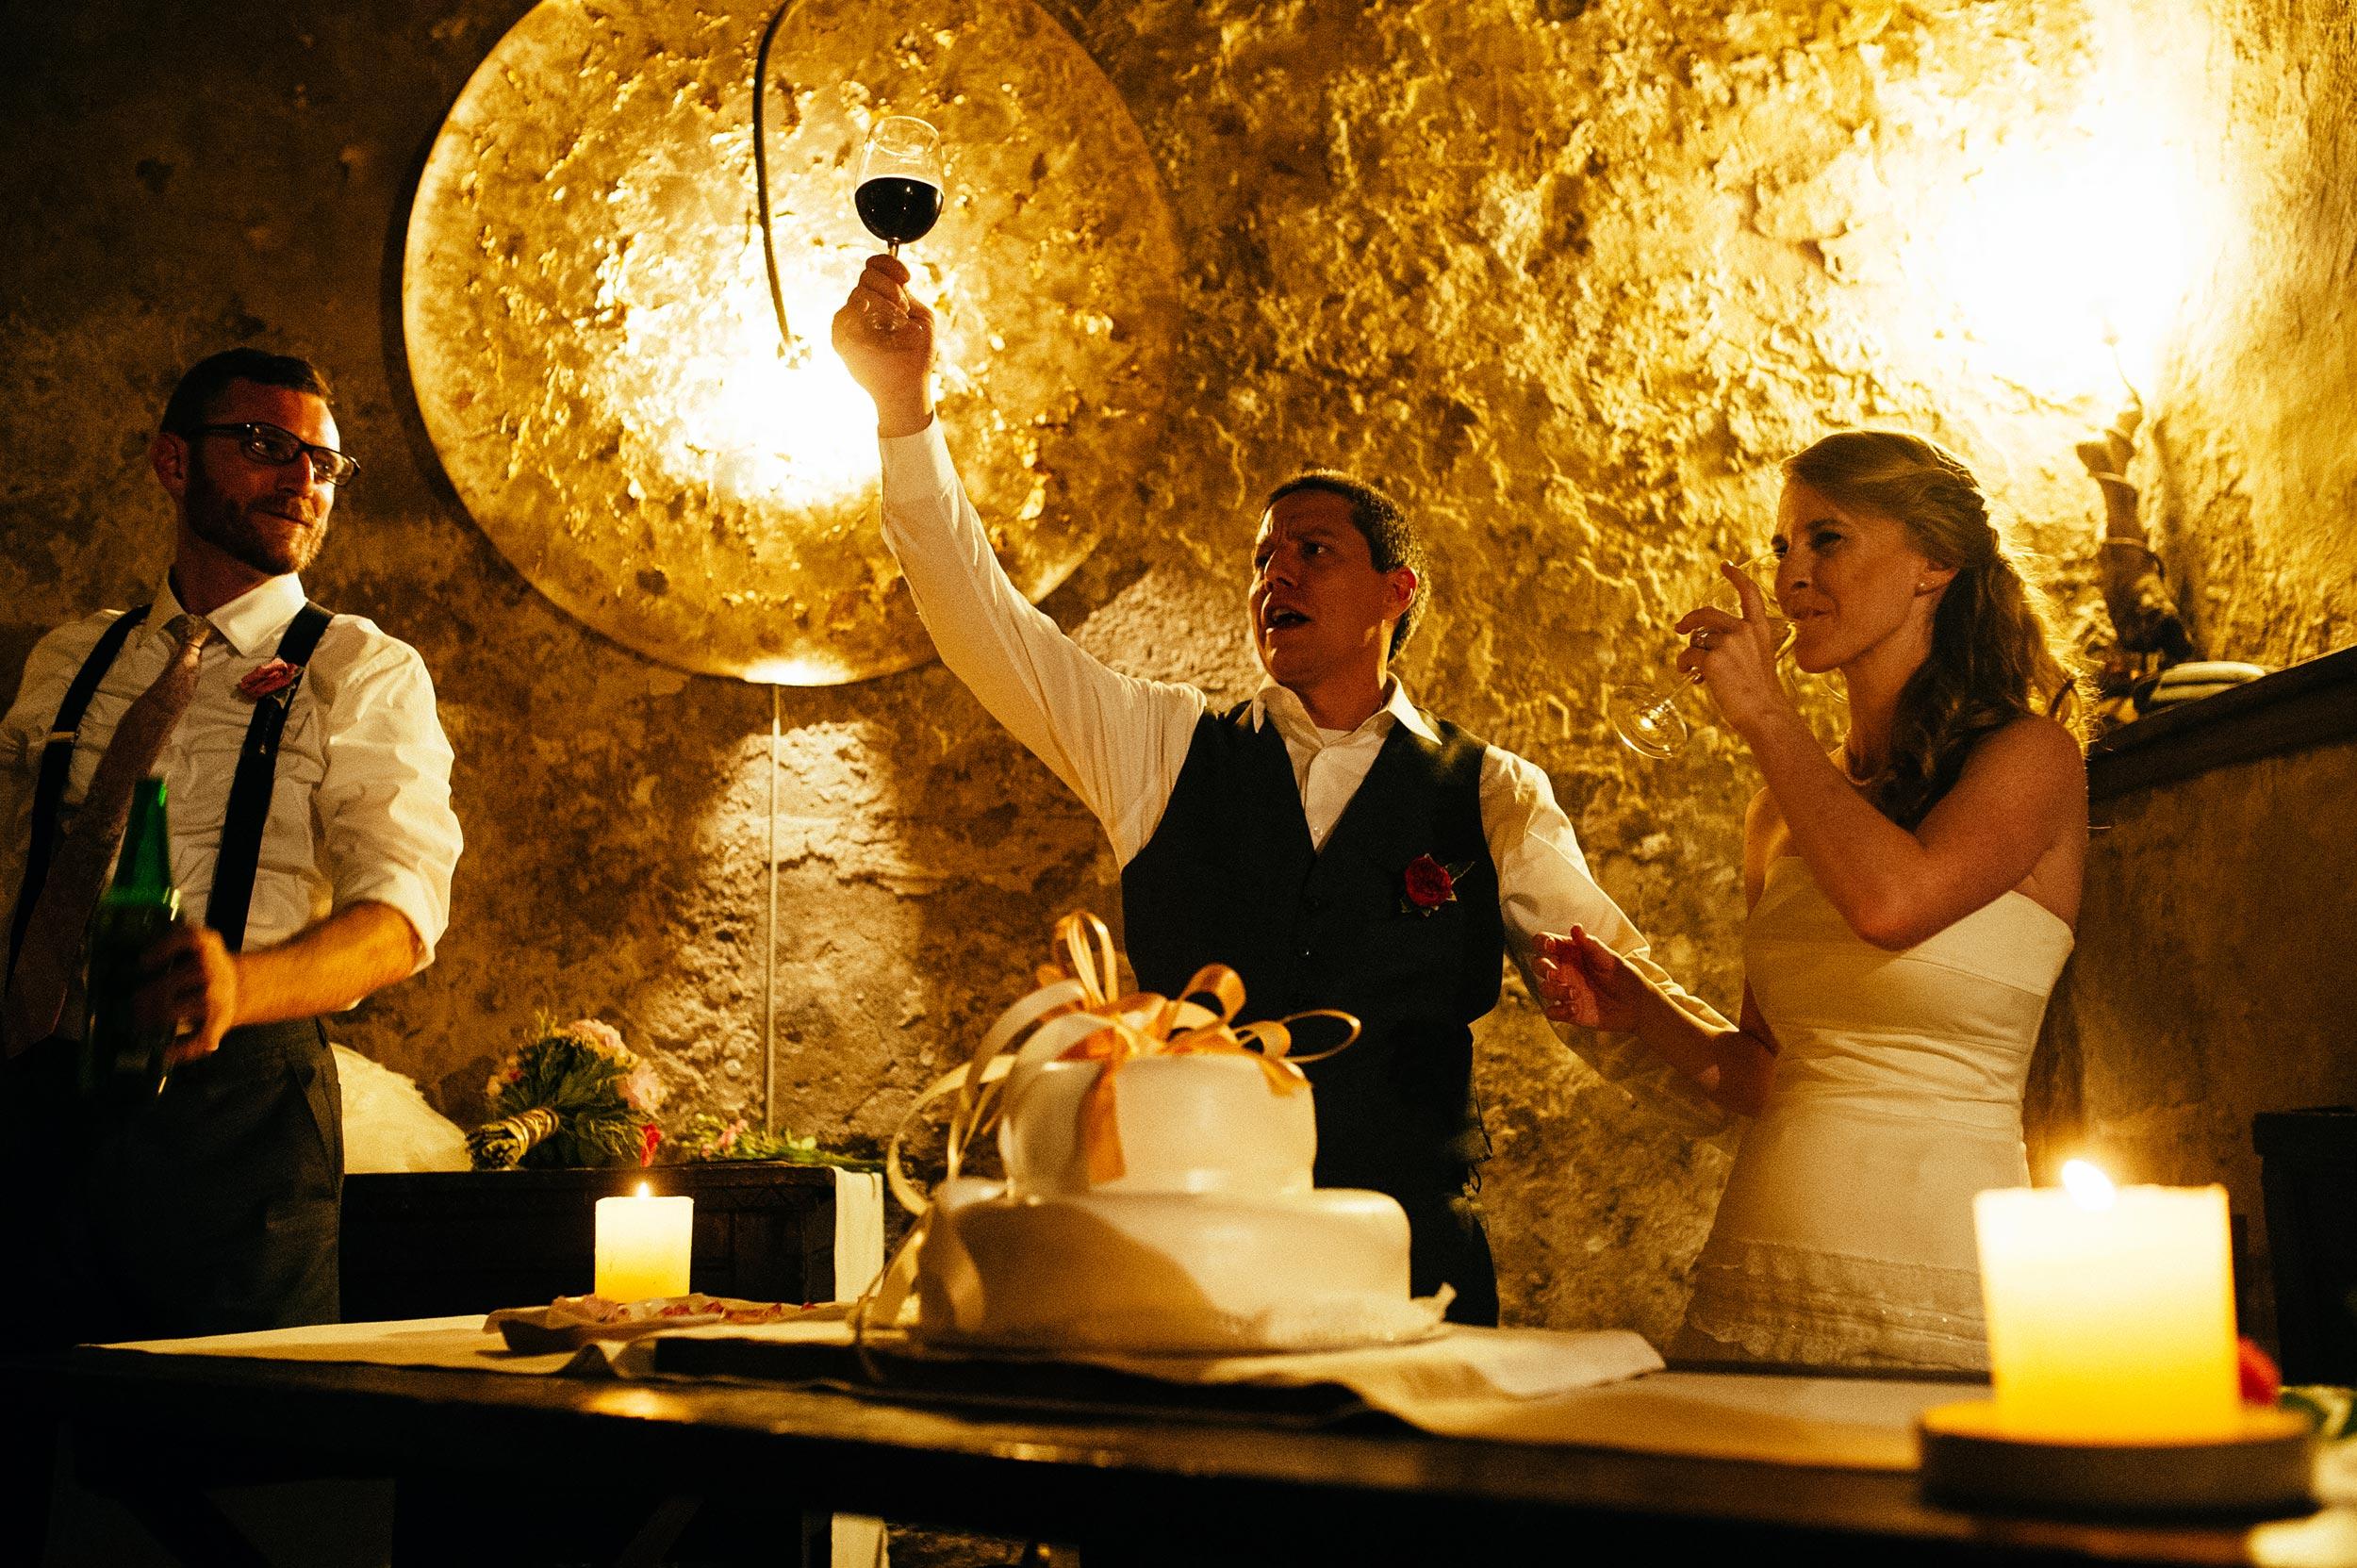 2014-Shelby-Jocelyn-Santo-Stefano-Di-Sessanio-Wedding-Photographer-Italy-Alessandro-Avenali-43.jpg